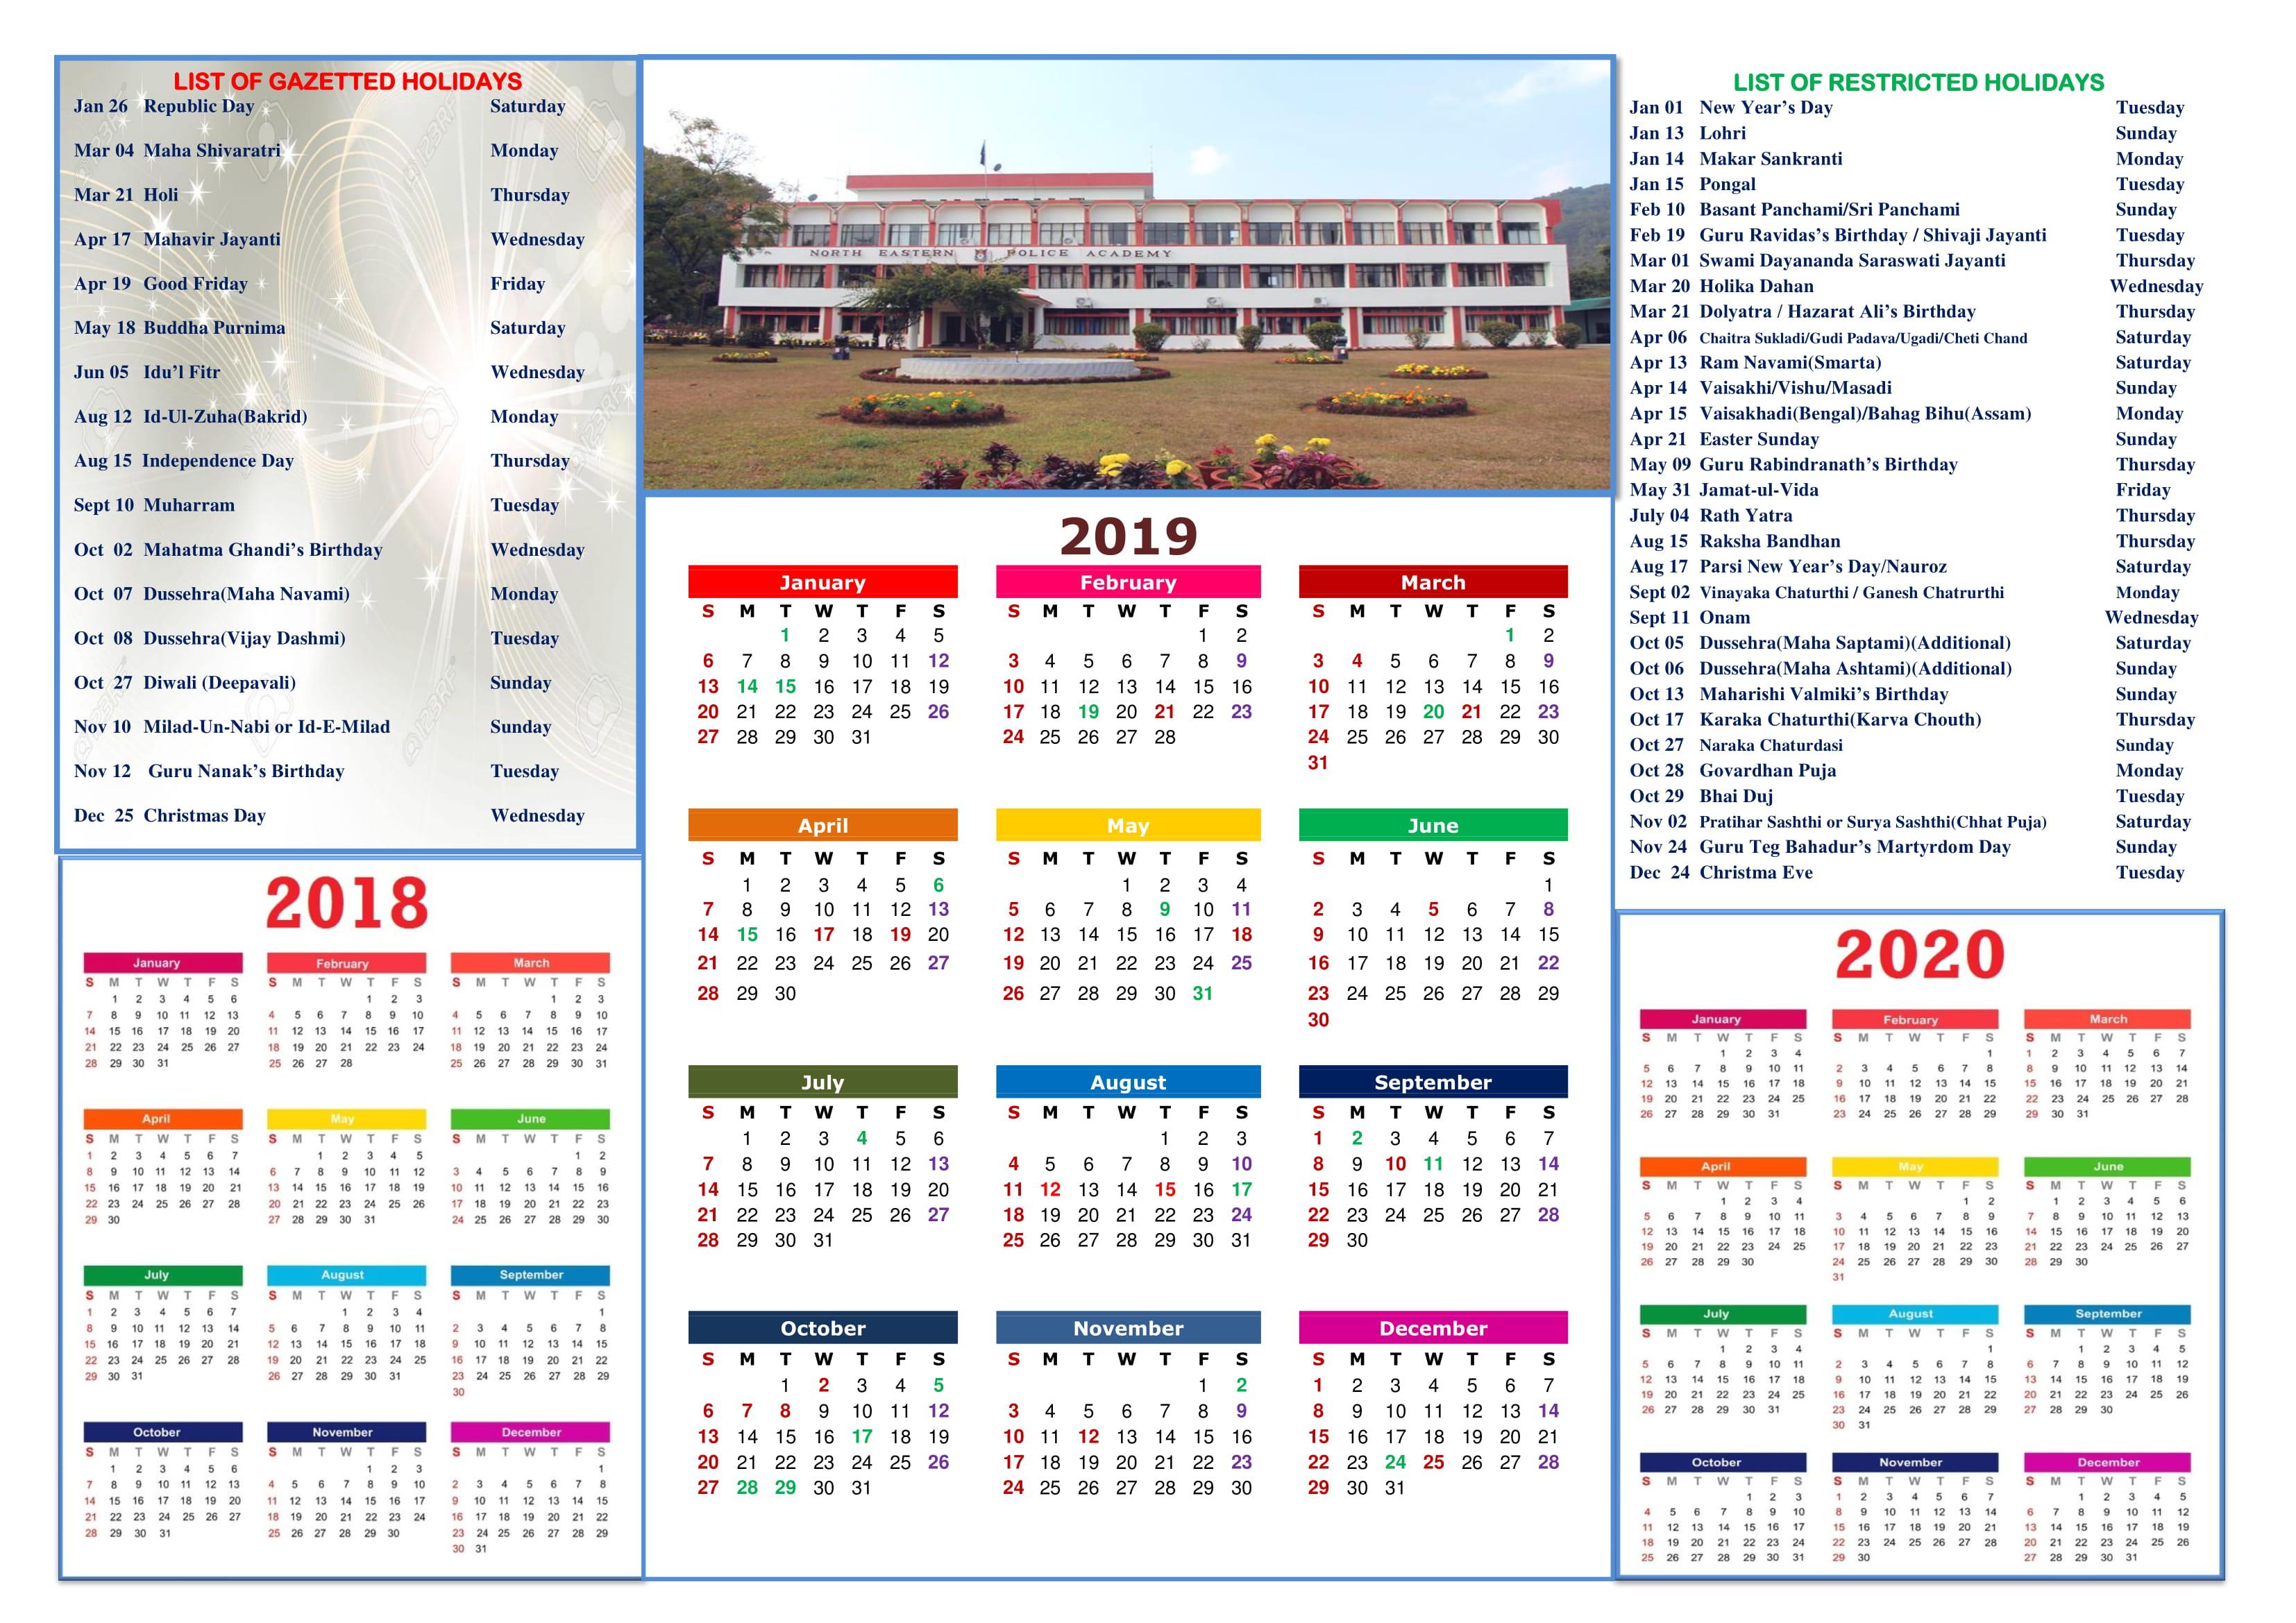 3 Month Calendar Holder Govt throughout 3 Month Calendar Holder